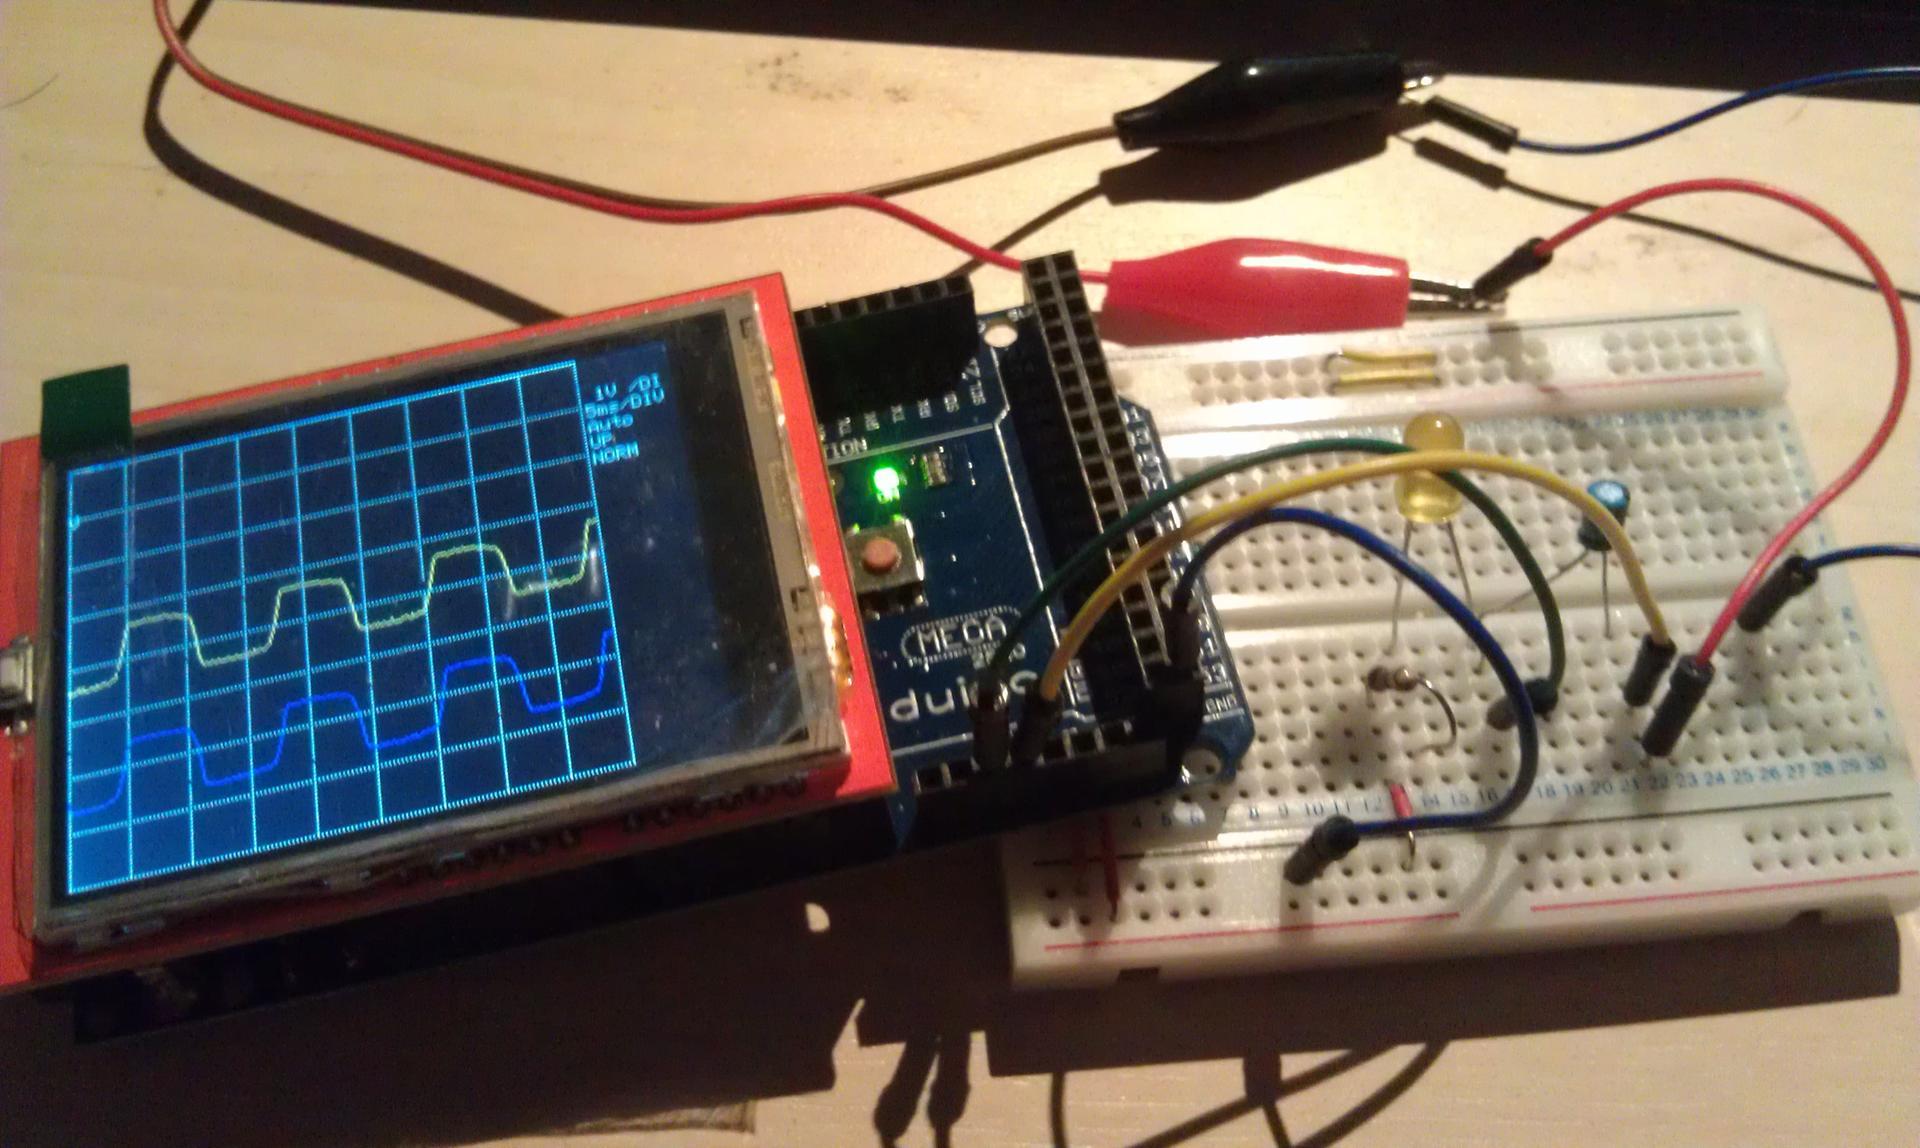 Название: ideas-about-beaglebone-black-projects-on-pinterest-raspberry-pi-arduino-and-usb_simple-microcont.jpg Просмотров: 343  Размер: 221.3 Кб